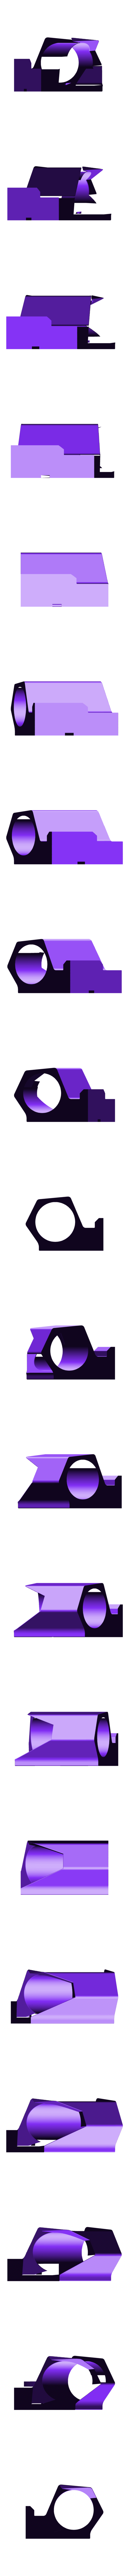 Jet_Pack_Right_Lower.stl Download free STL file Boba Fett Jet Pack Full Size • 3D printable model, bromego